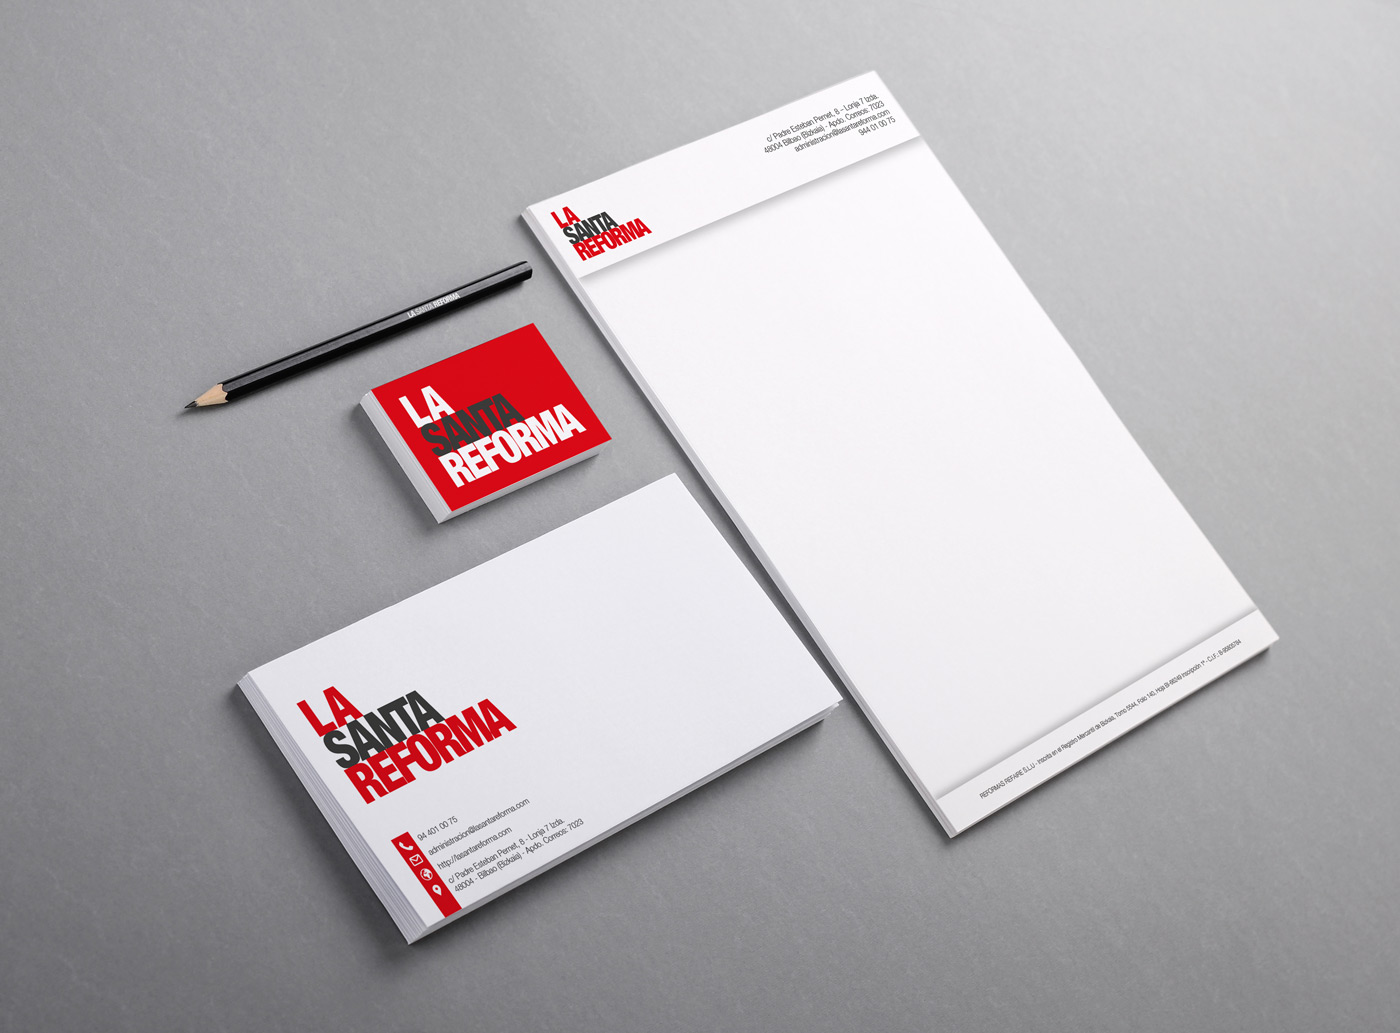 motiva-agencia-comunicacion_branding-naming_la-santa-reforma